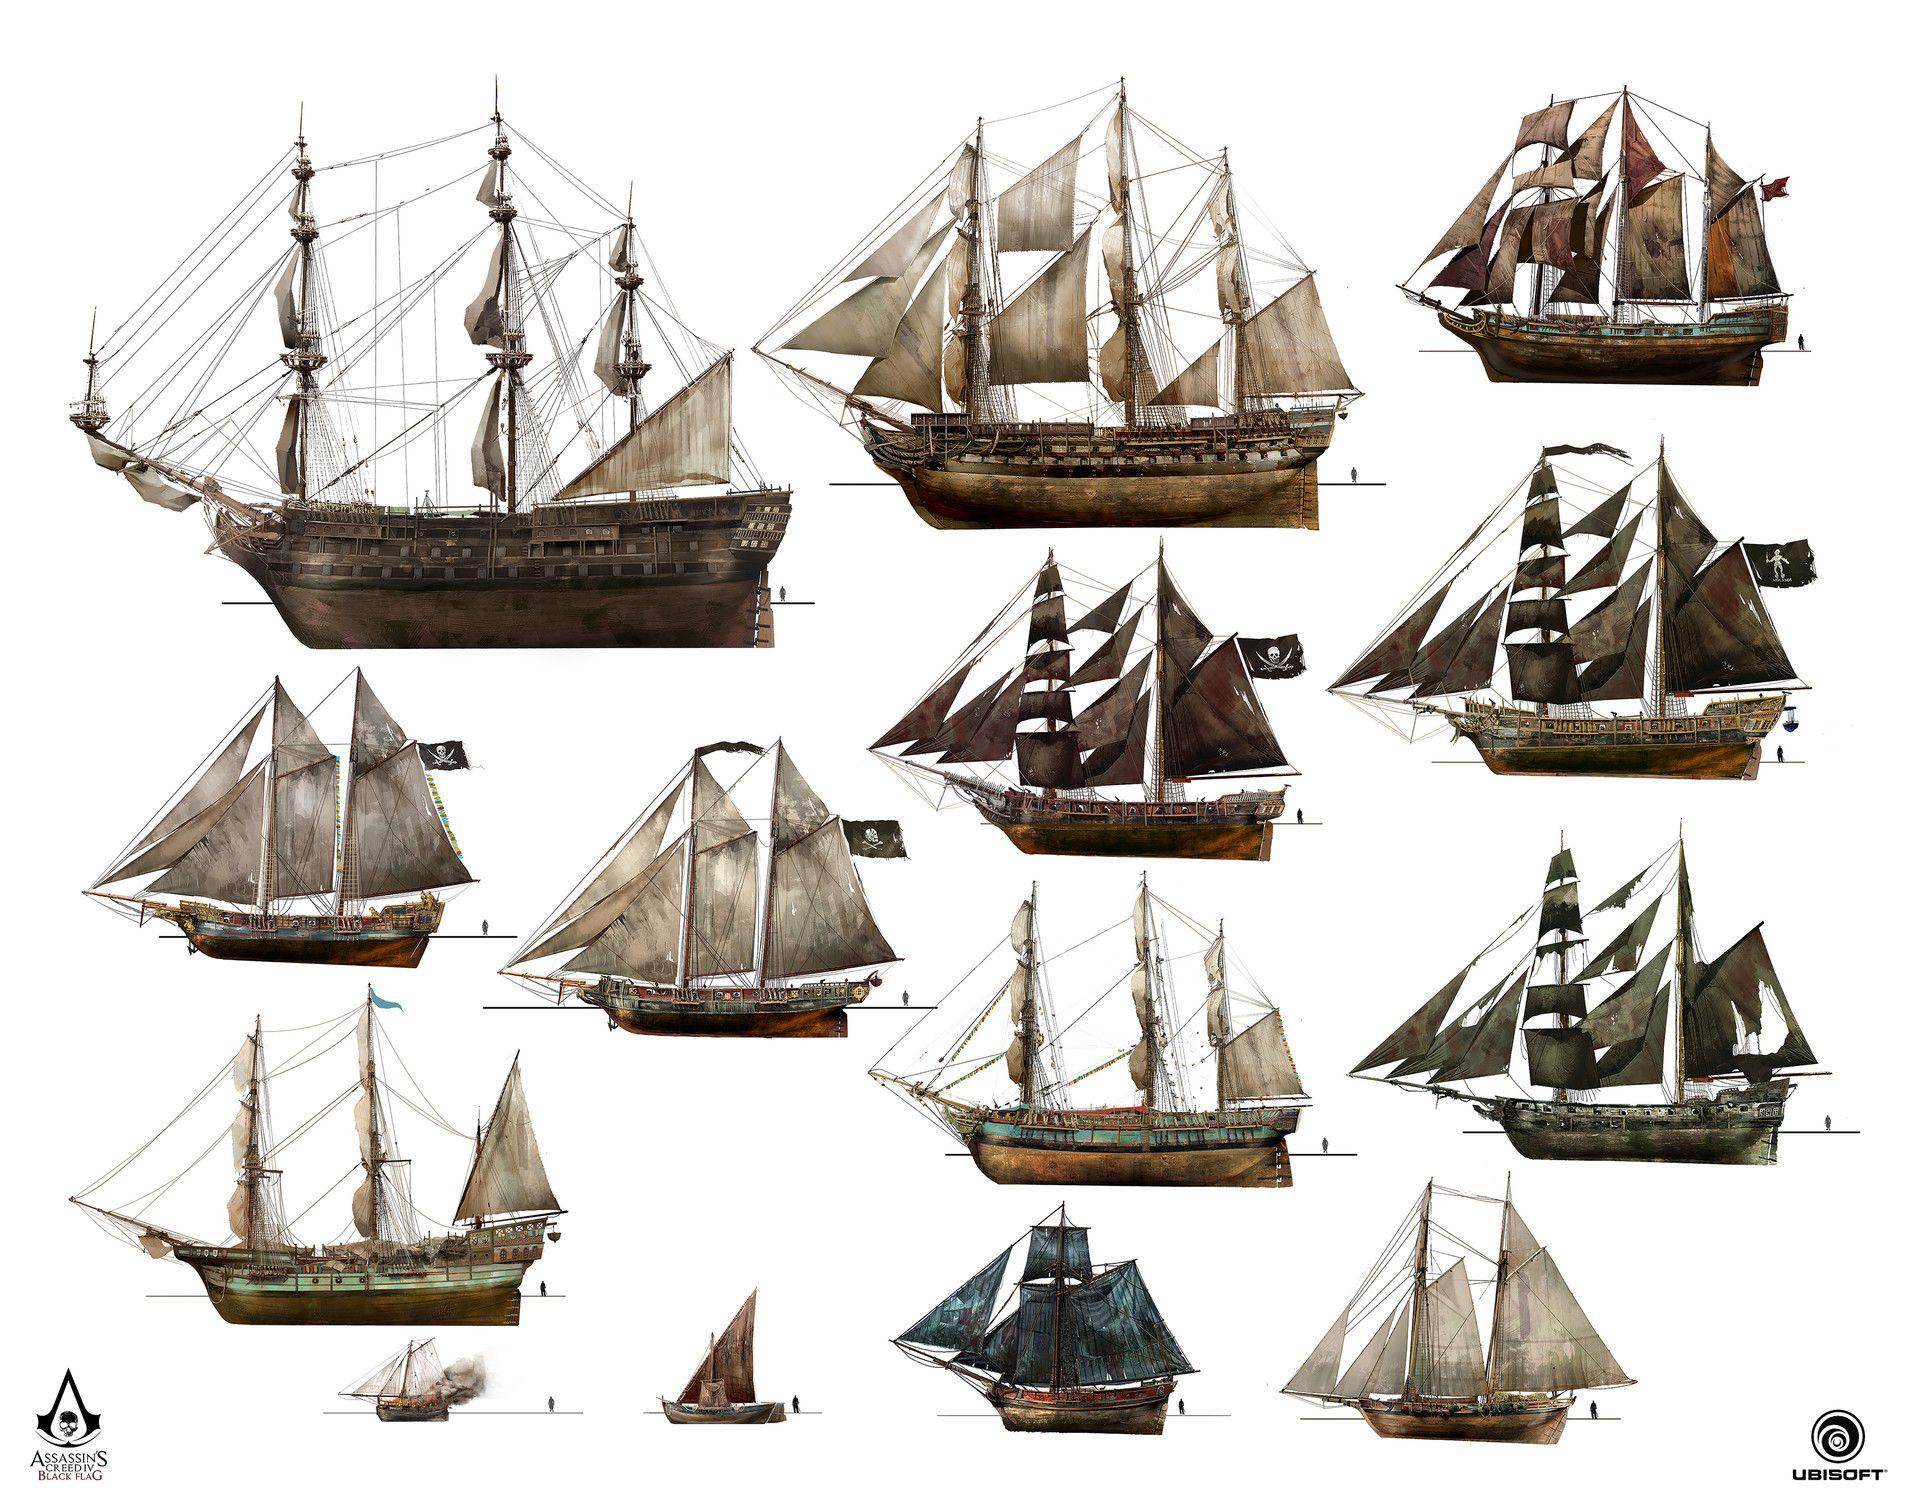 Artstation Assassin S Creed Iv Black Flag Unique Ships Design Teo Yong Jin Assassins Creed Black Flag Assassins Creed Black Flag